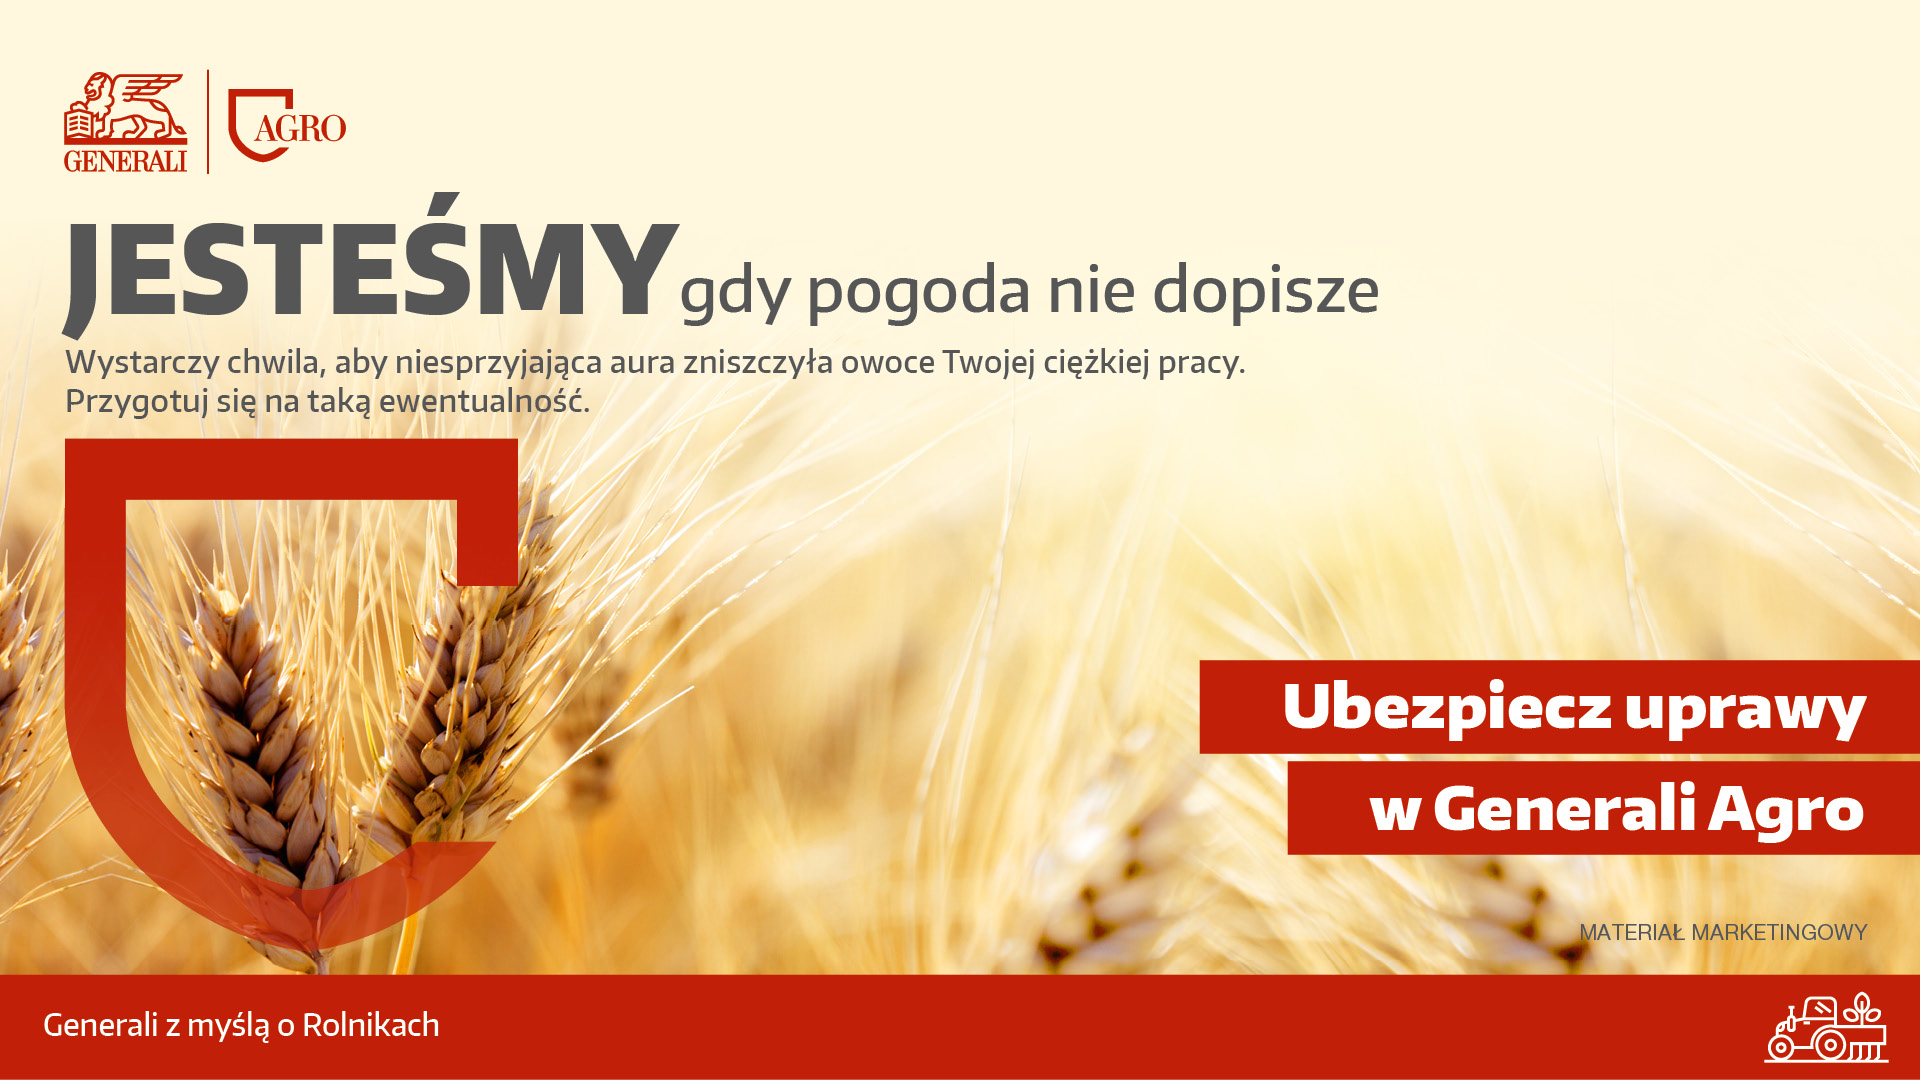 Generali_Agro_BS_2021_Uprawy_baner_1920x1080px